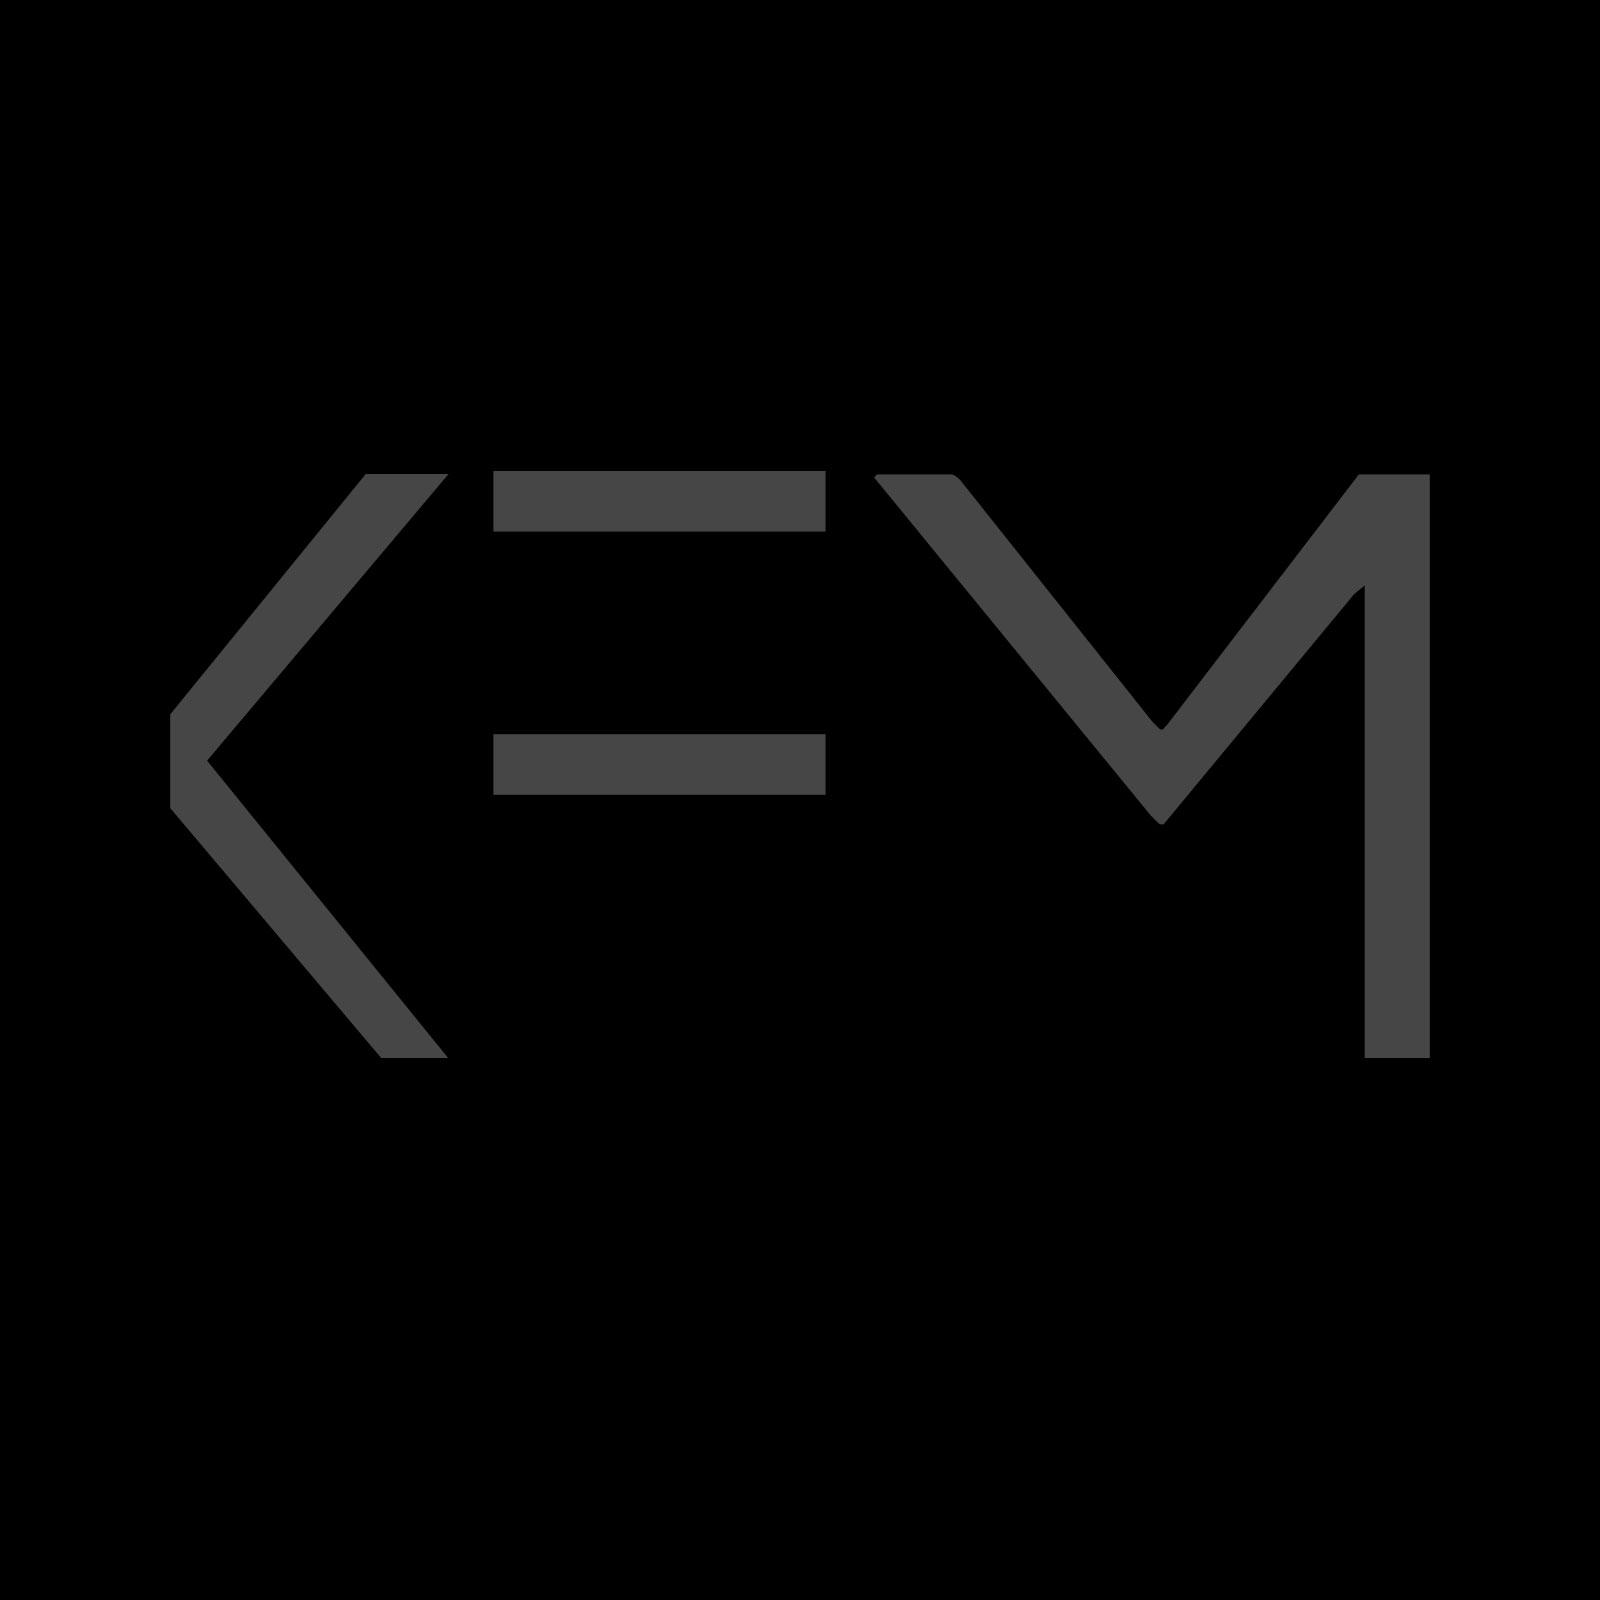 KFM Planet